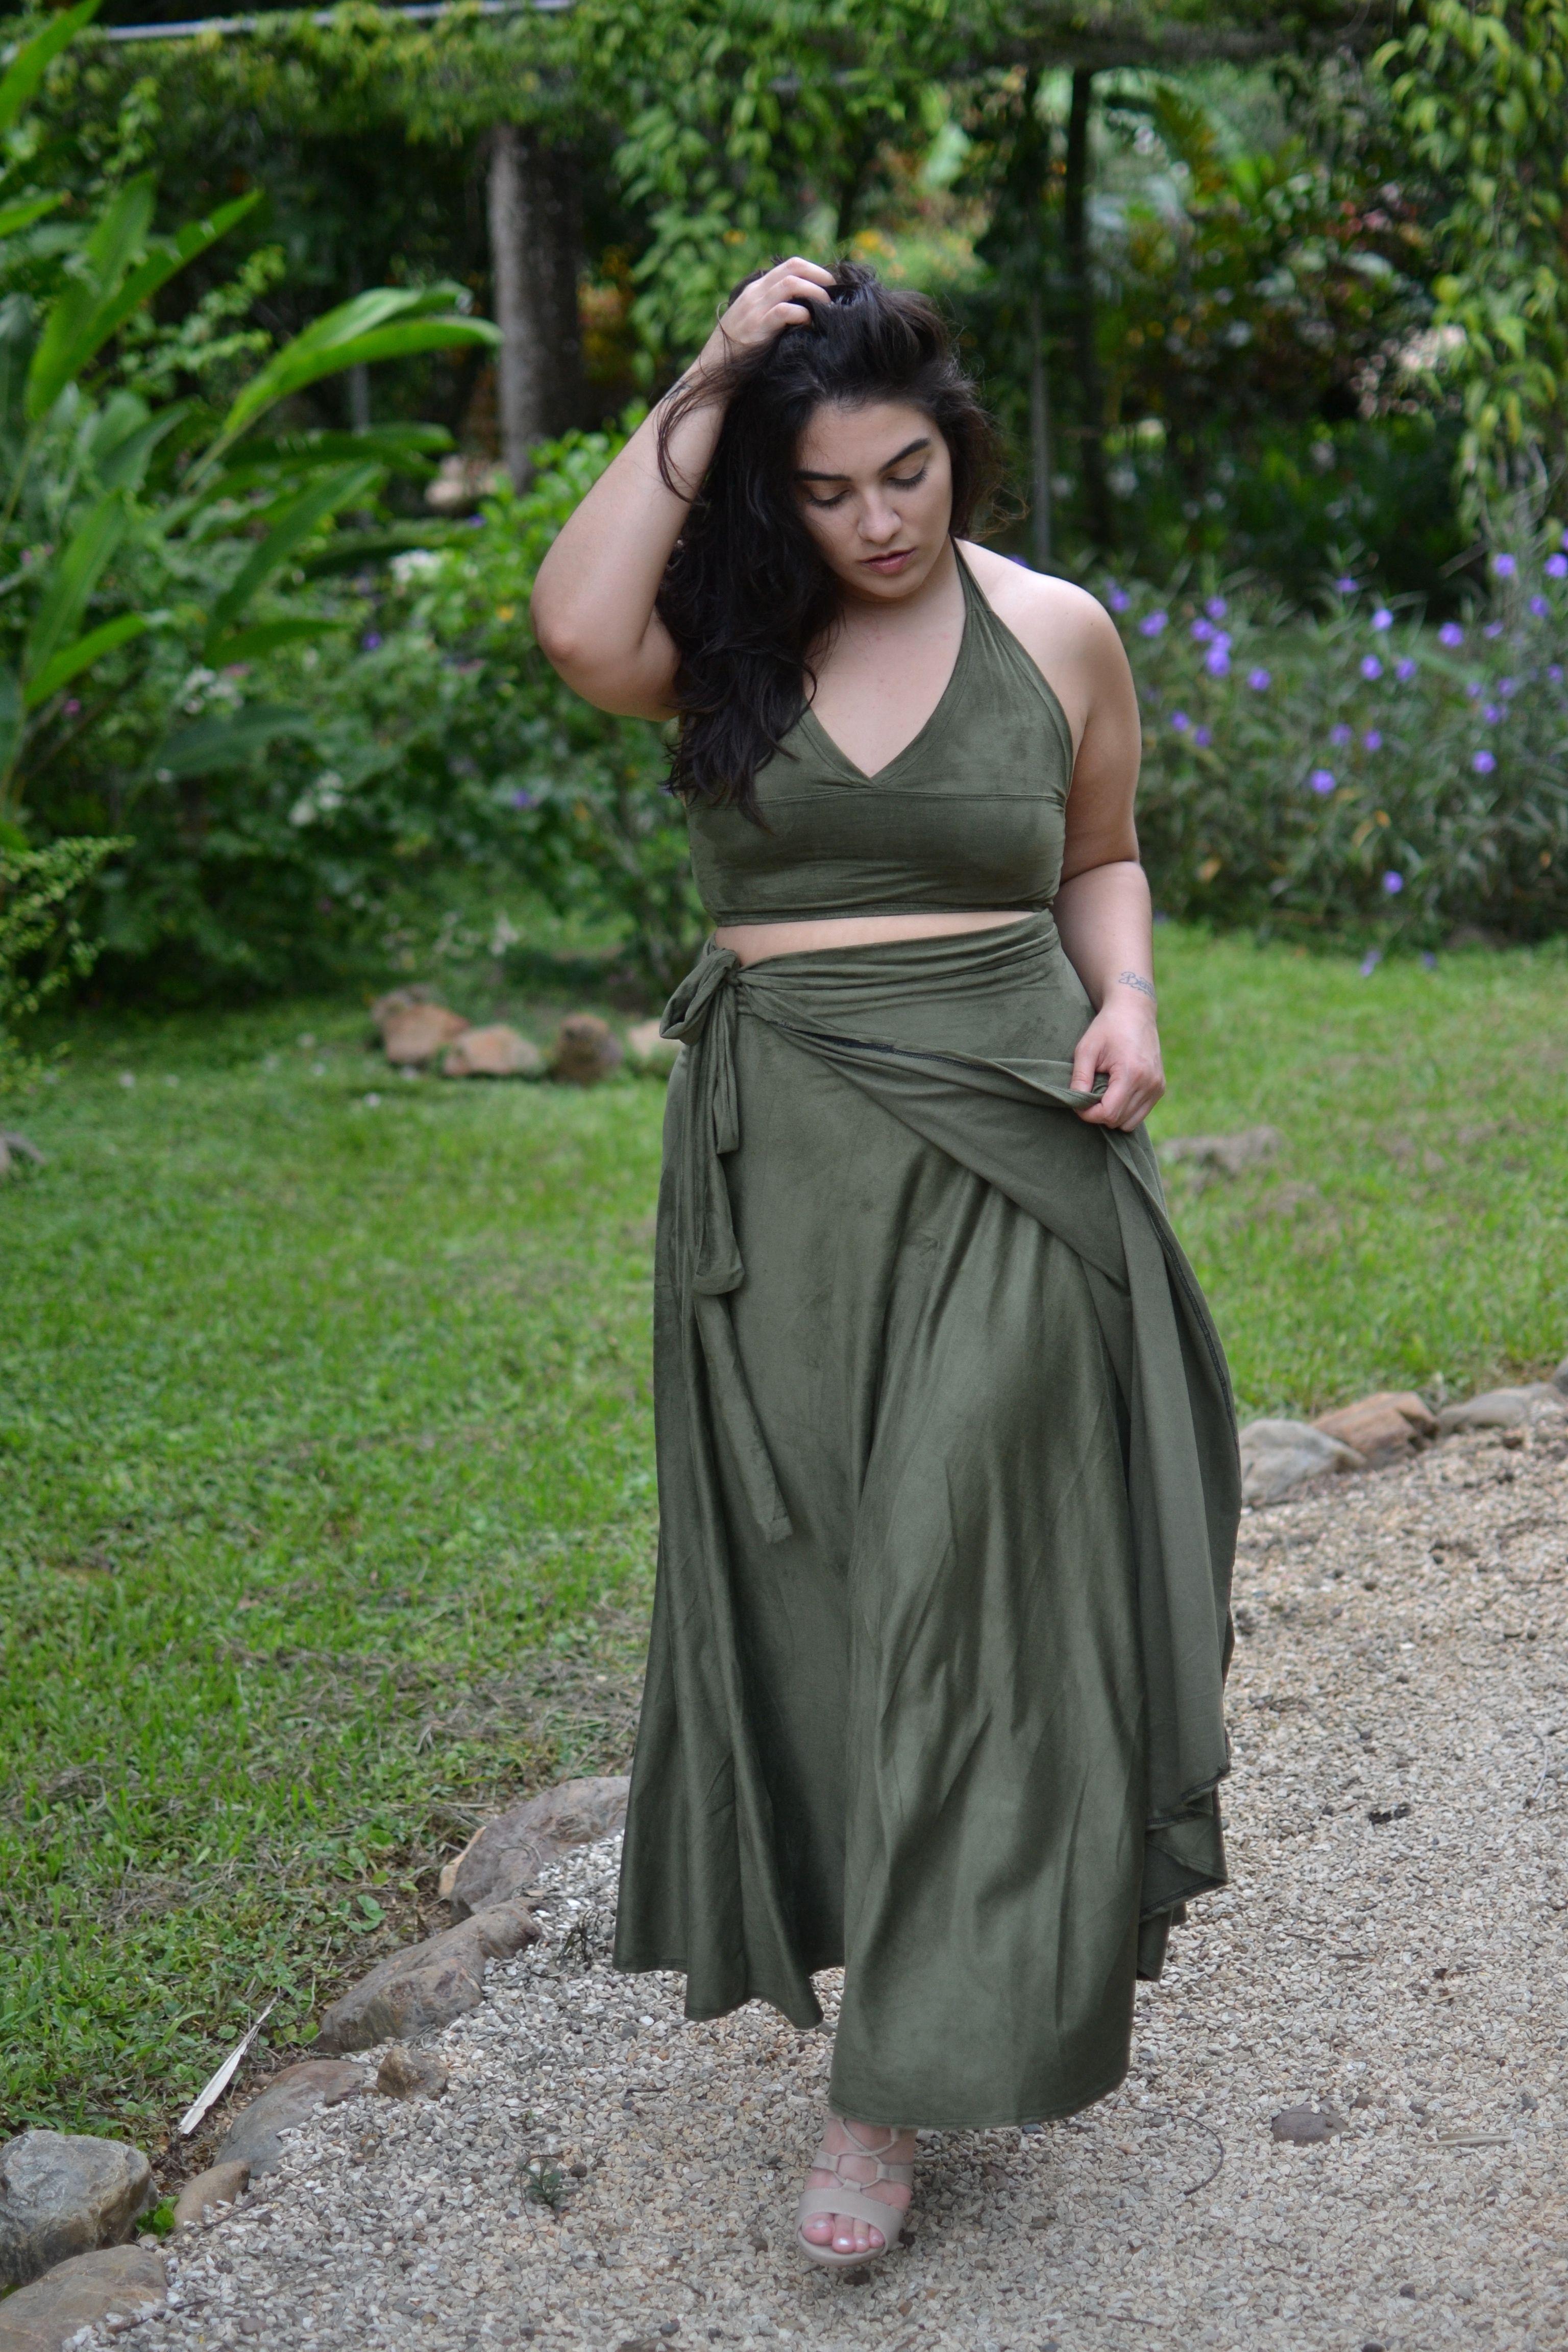 Olive green piece plus size fashion pinterest curvy nadia